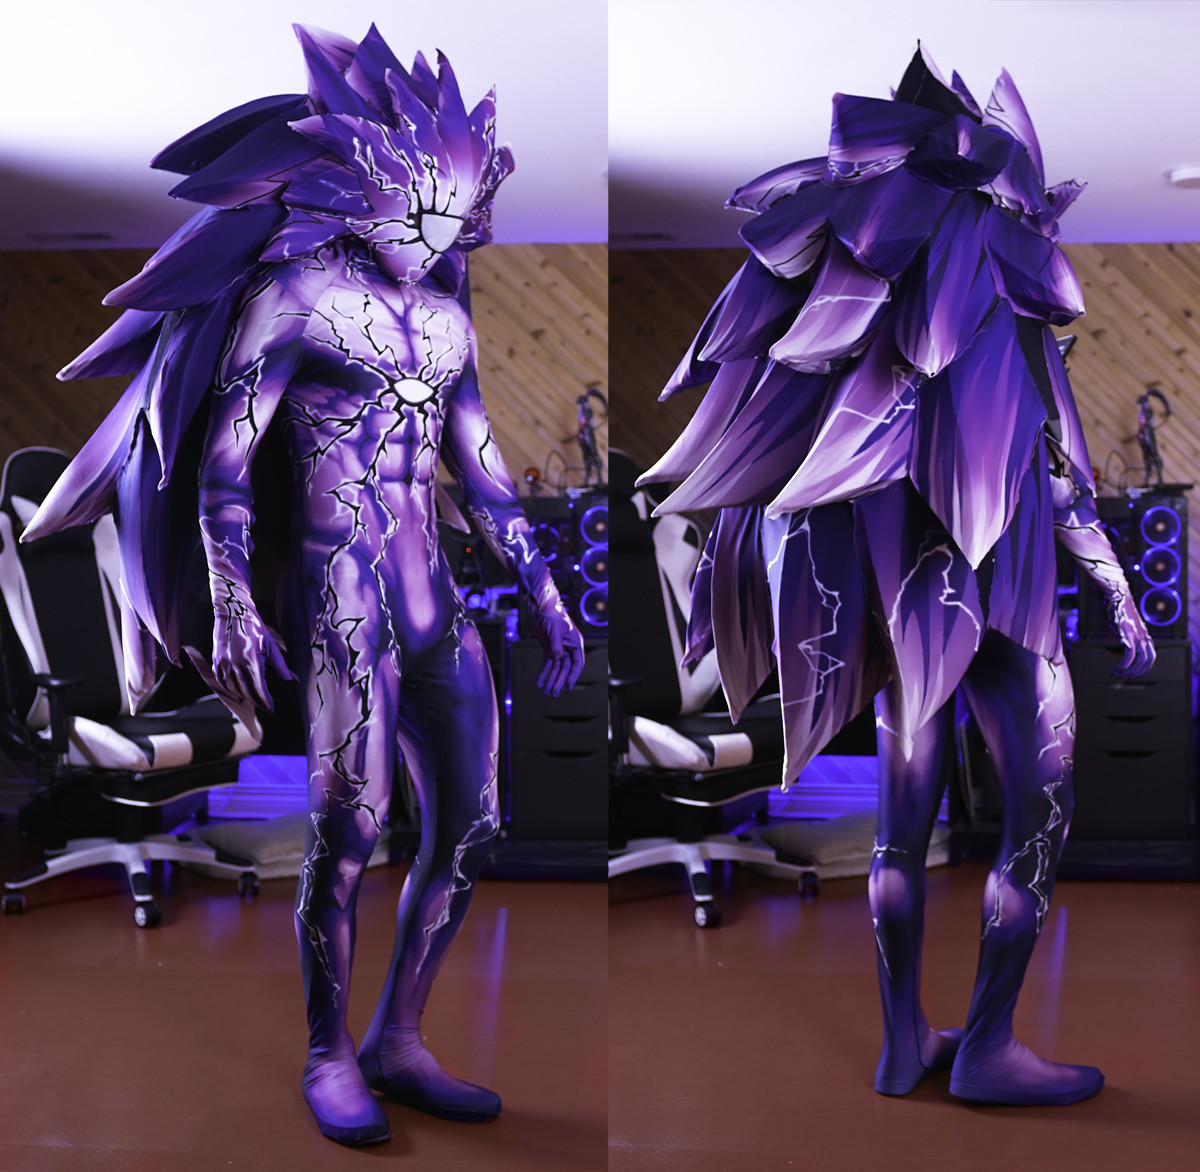 Lord Boros Cosplay. .. Goddamn dude that's an amazing cosplay